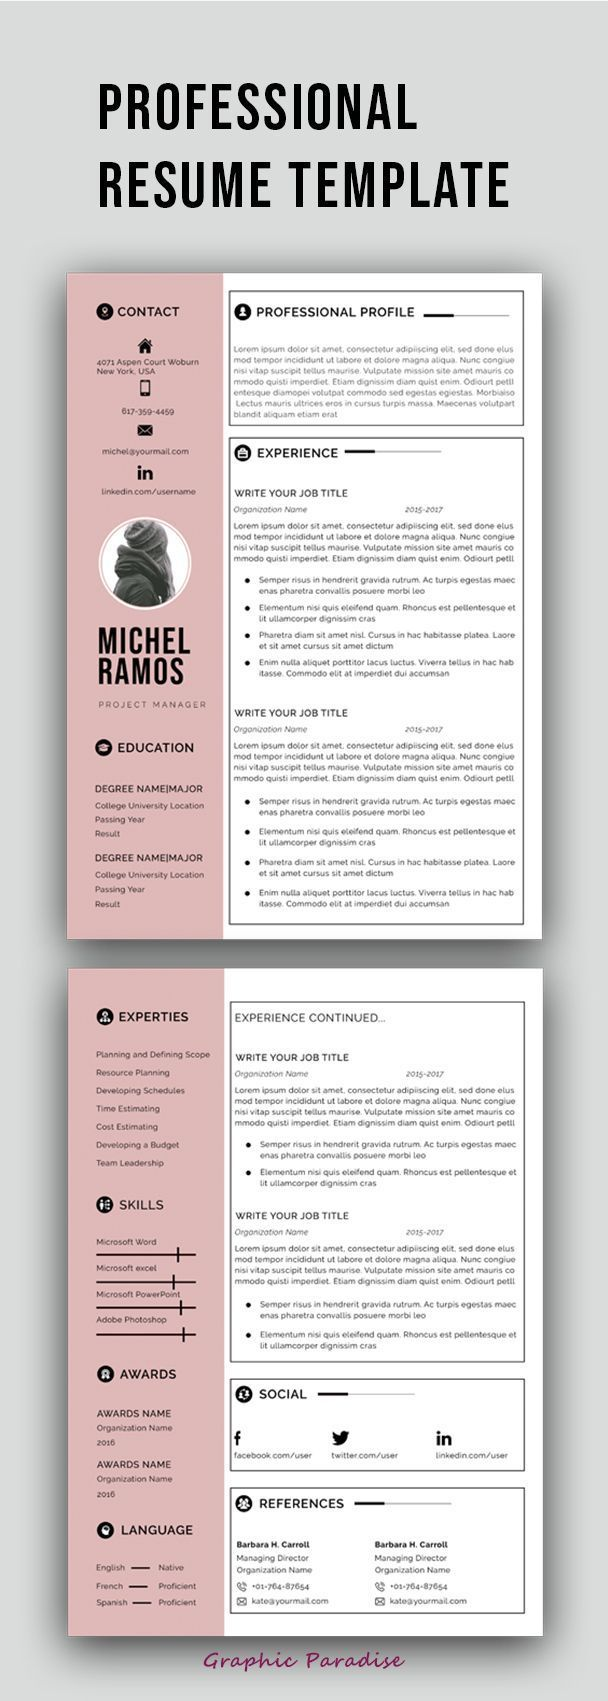 Resume Template Professional Microsoft Word Creative Resume Template Free Ideas Design Modern Resume Template Free Word Ideas Resume Design Infographic Resume Resume